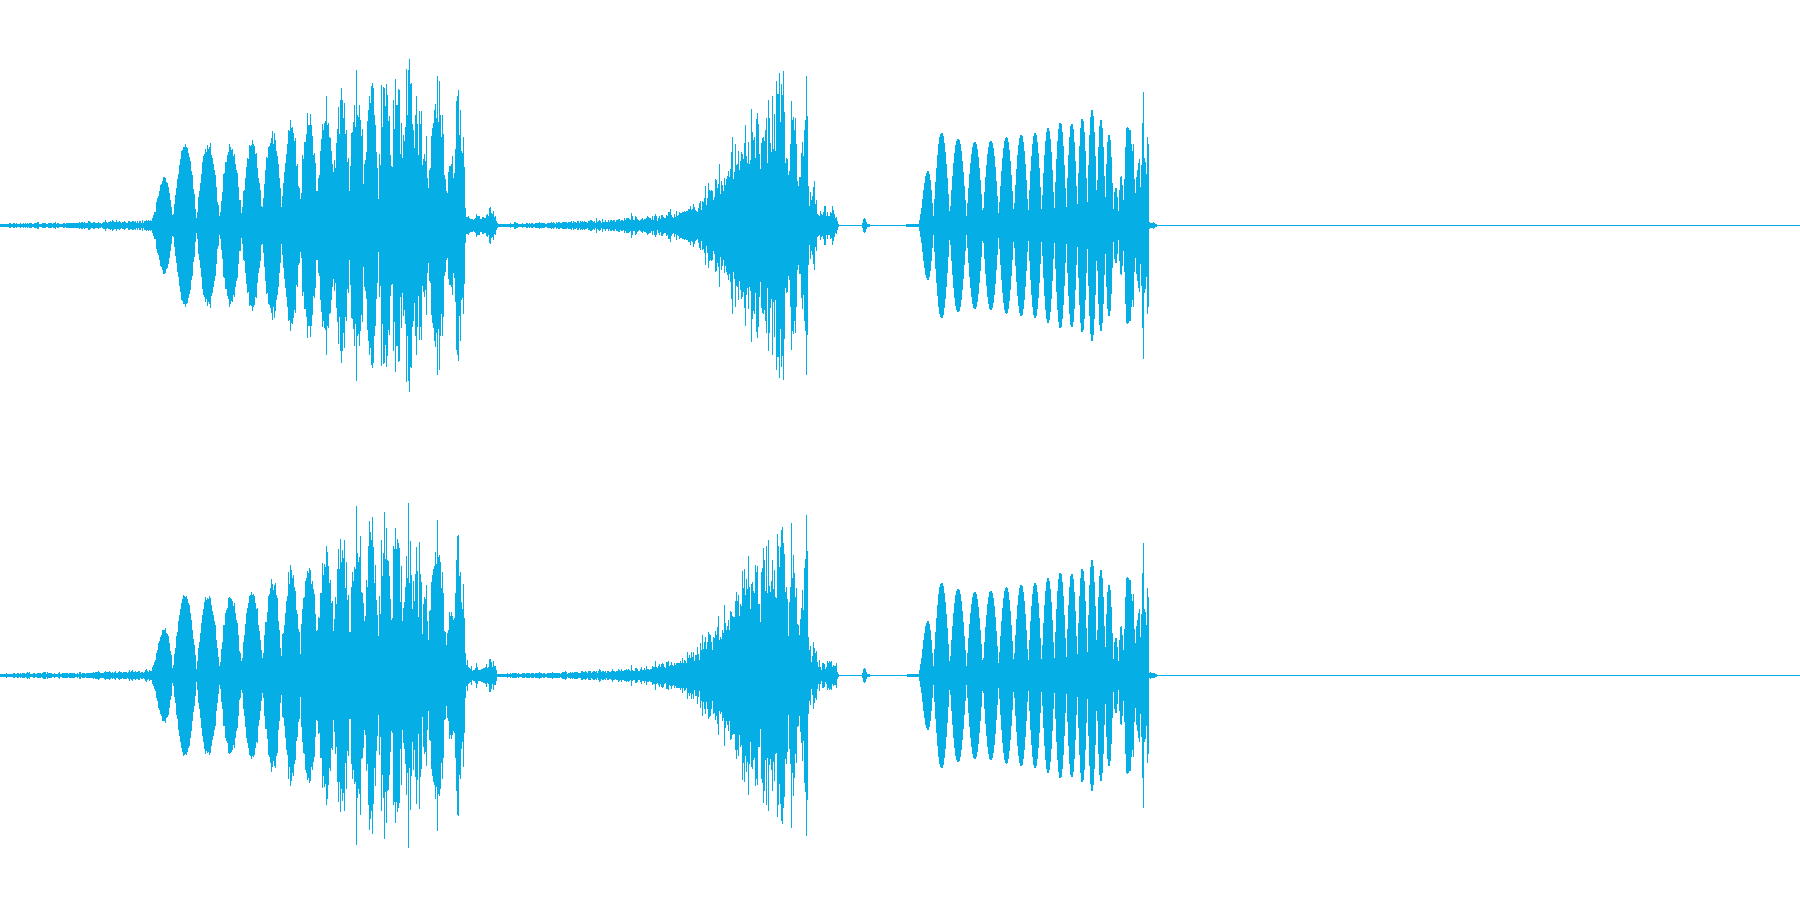 DJミキサー卓でのスクラッチ音の再生済みの波形